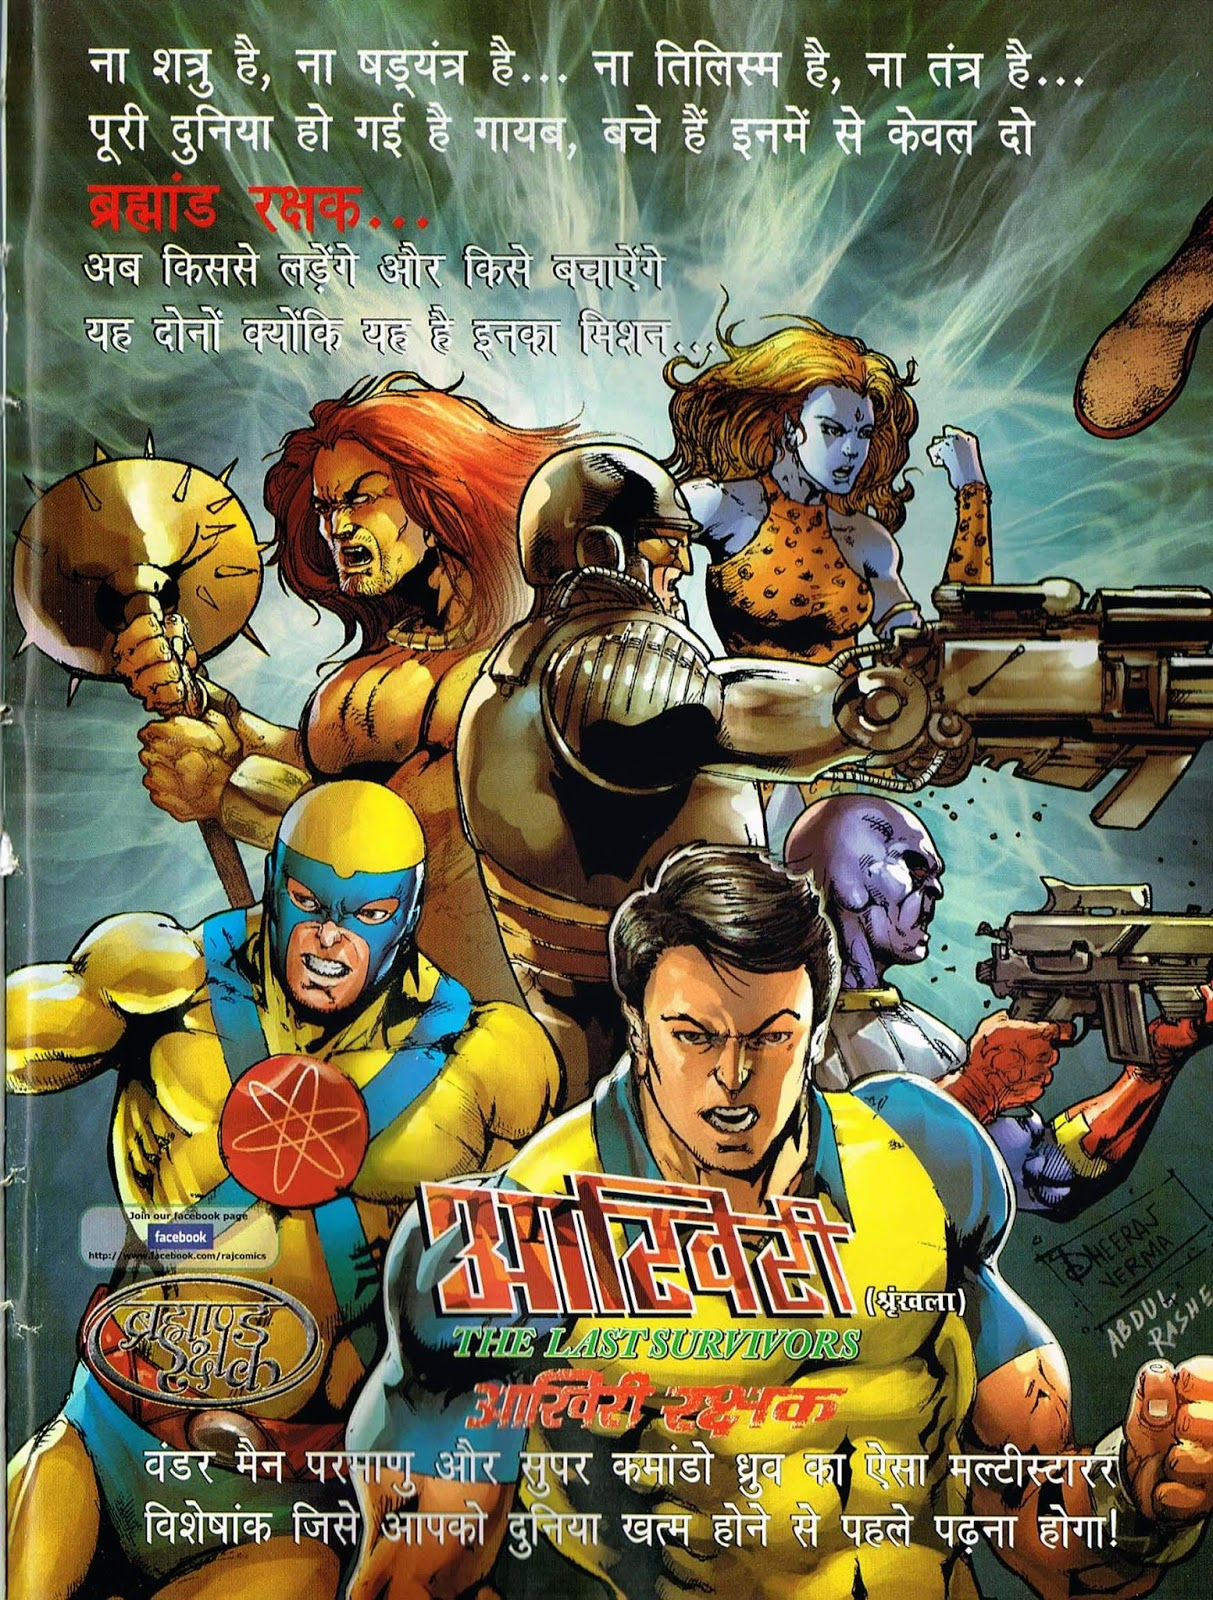 Nagraj takshak download games